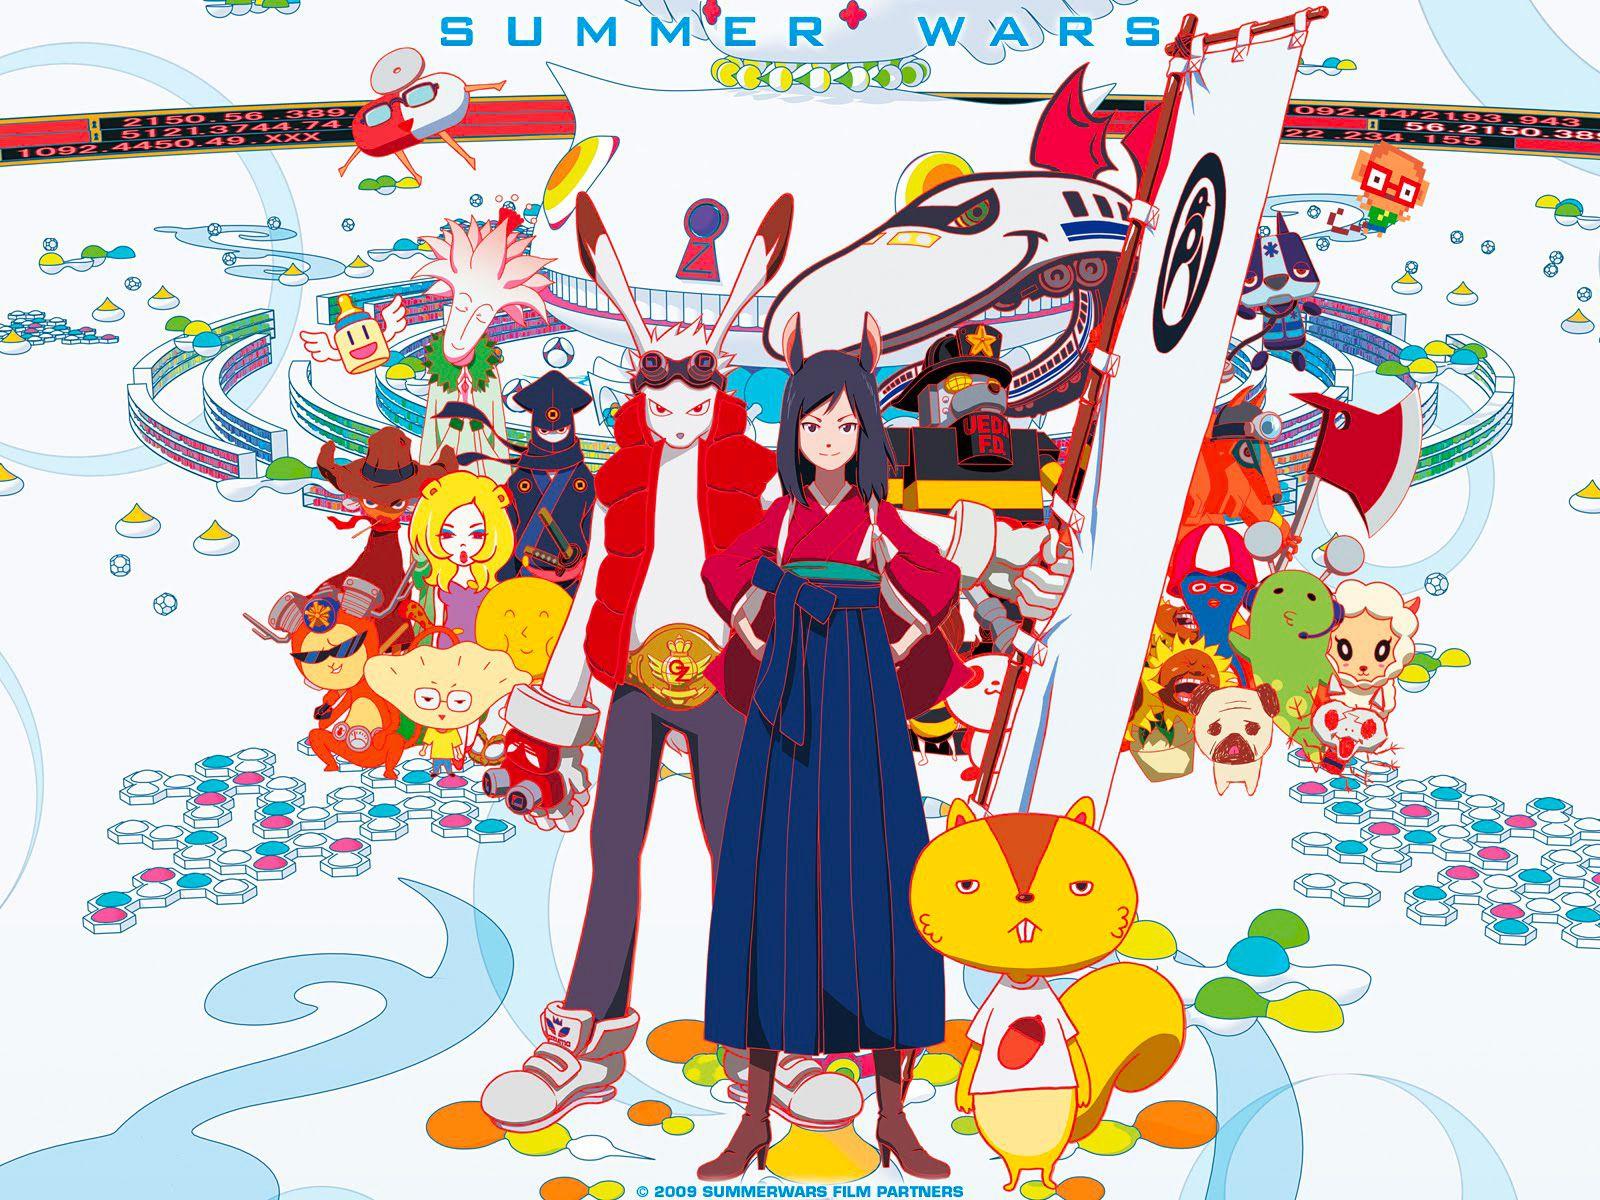 Summer wars visual 3